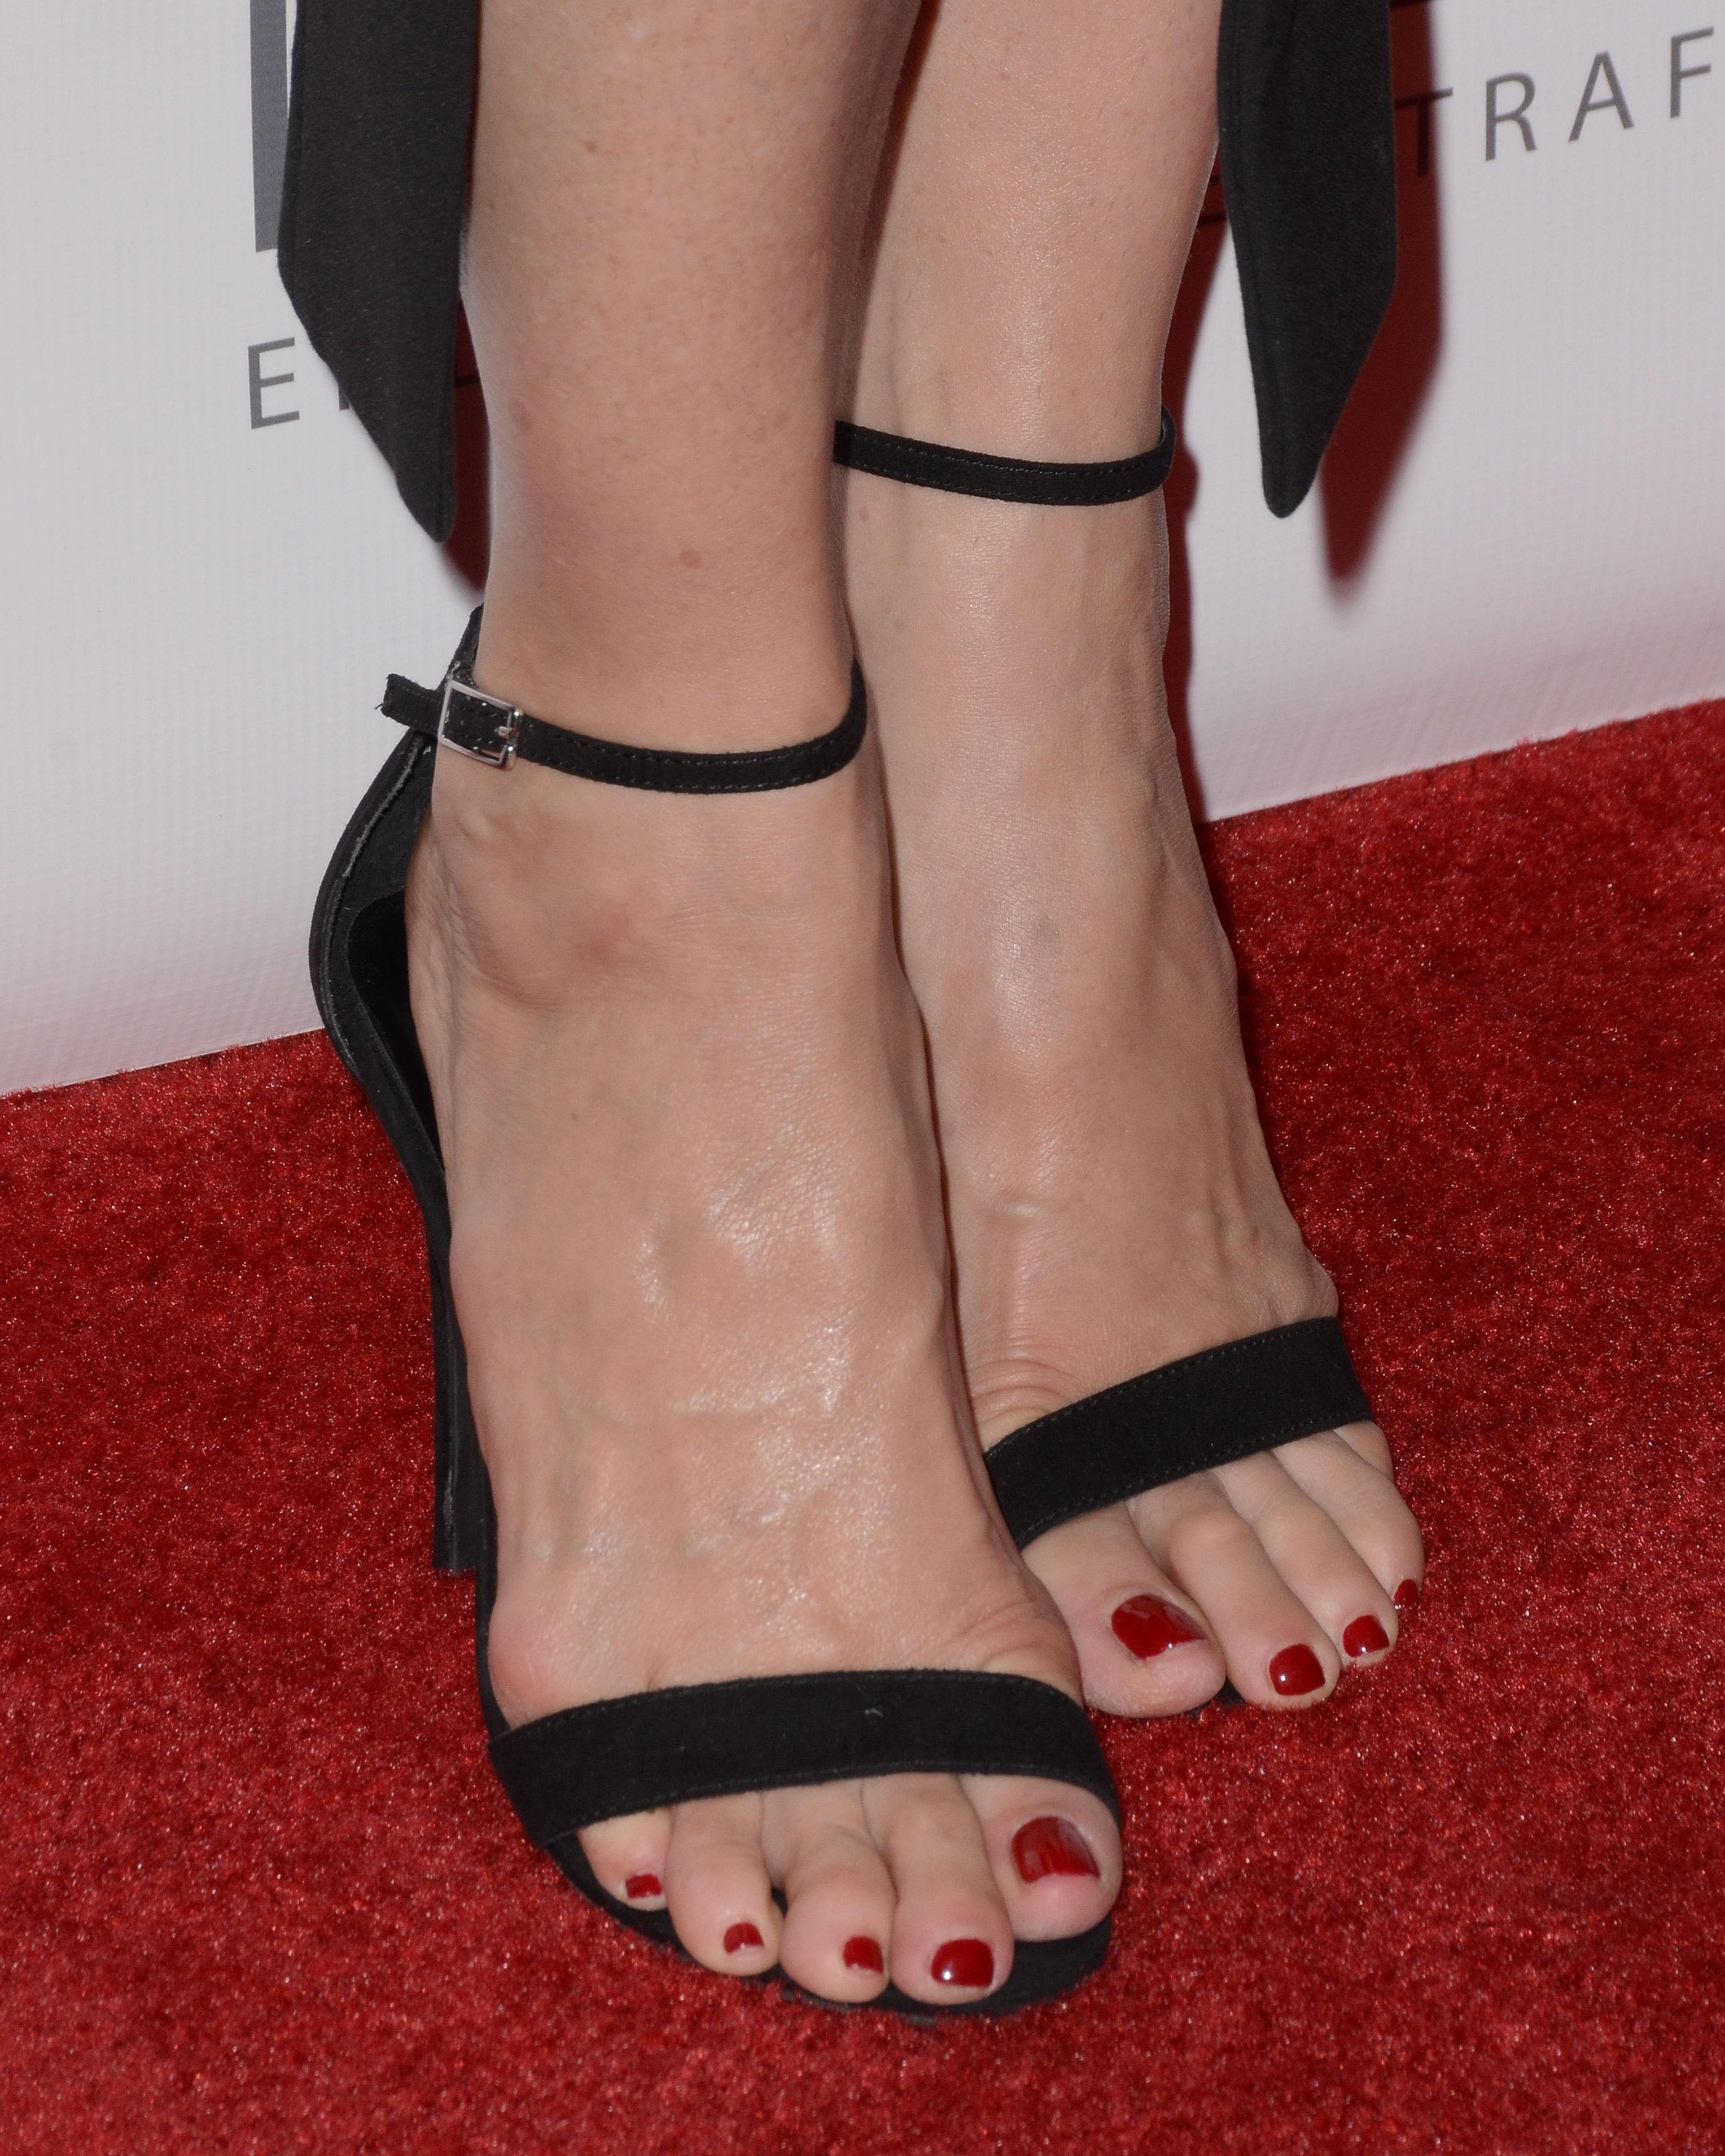 Bigfoot Celebrity: Jenna Elfman Feet